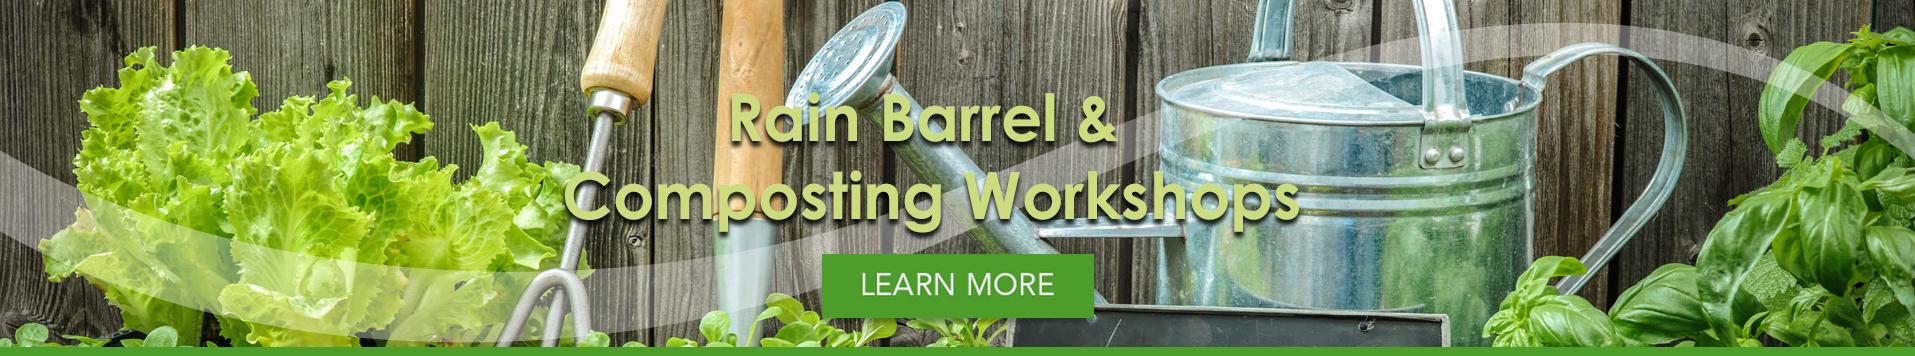 Composting and Rain Barrel Workshop